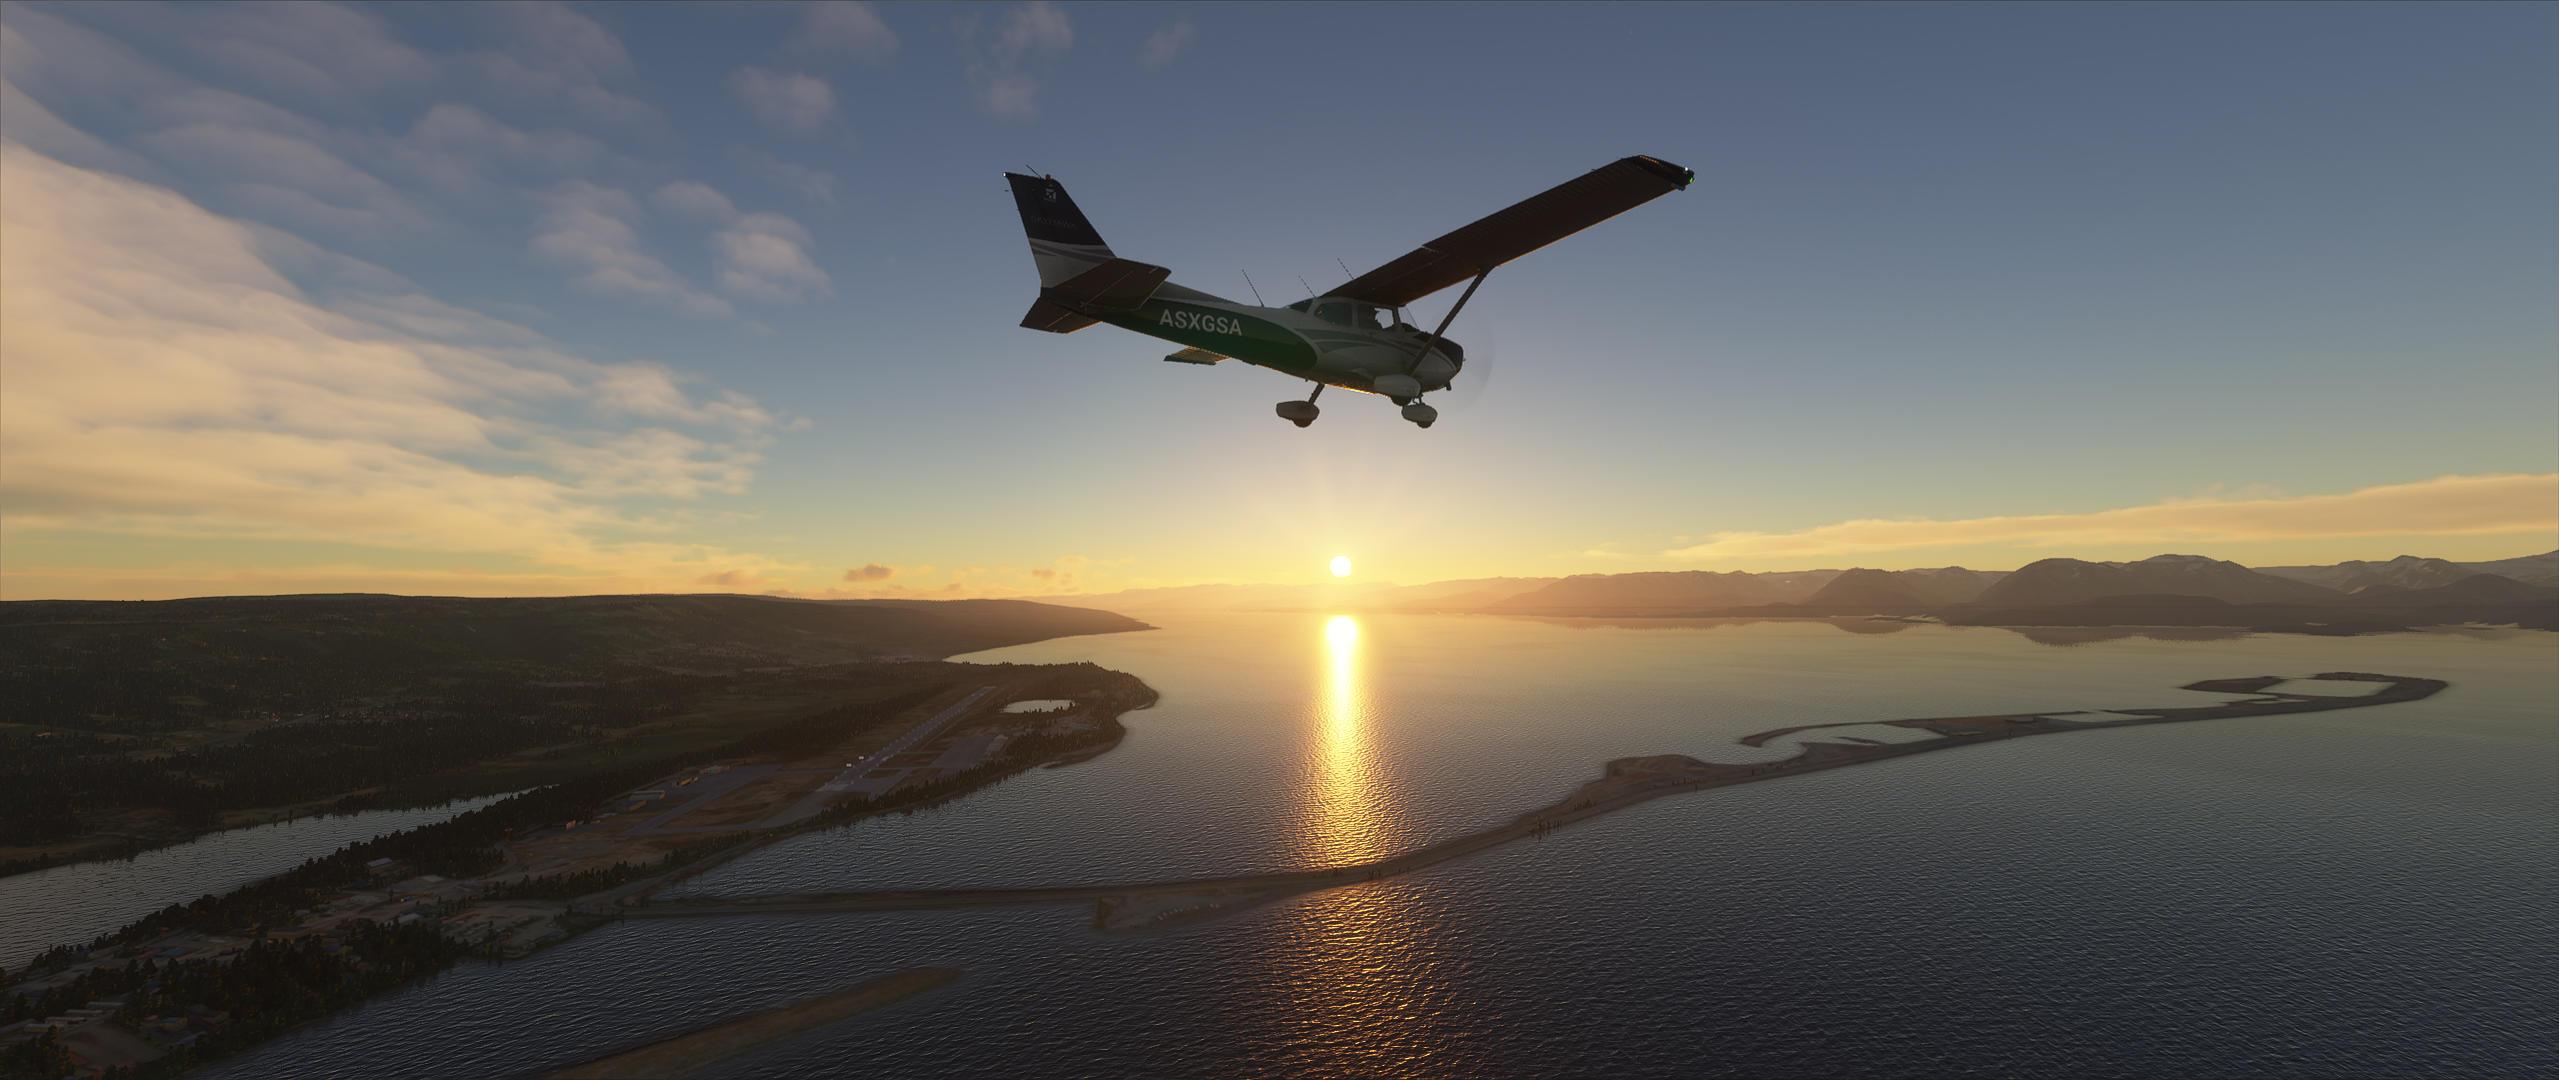 MS Flight Simulator 2020 C172 over the Homer Spit